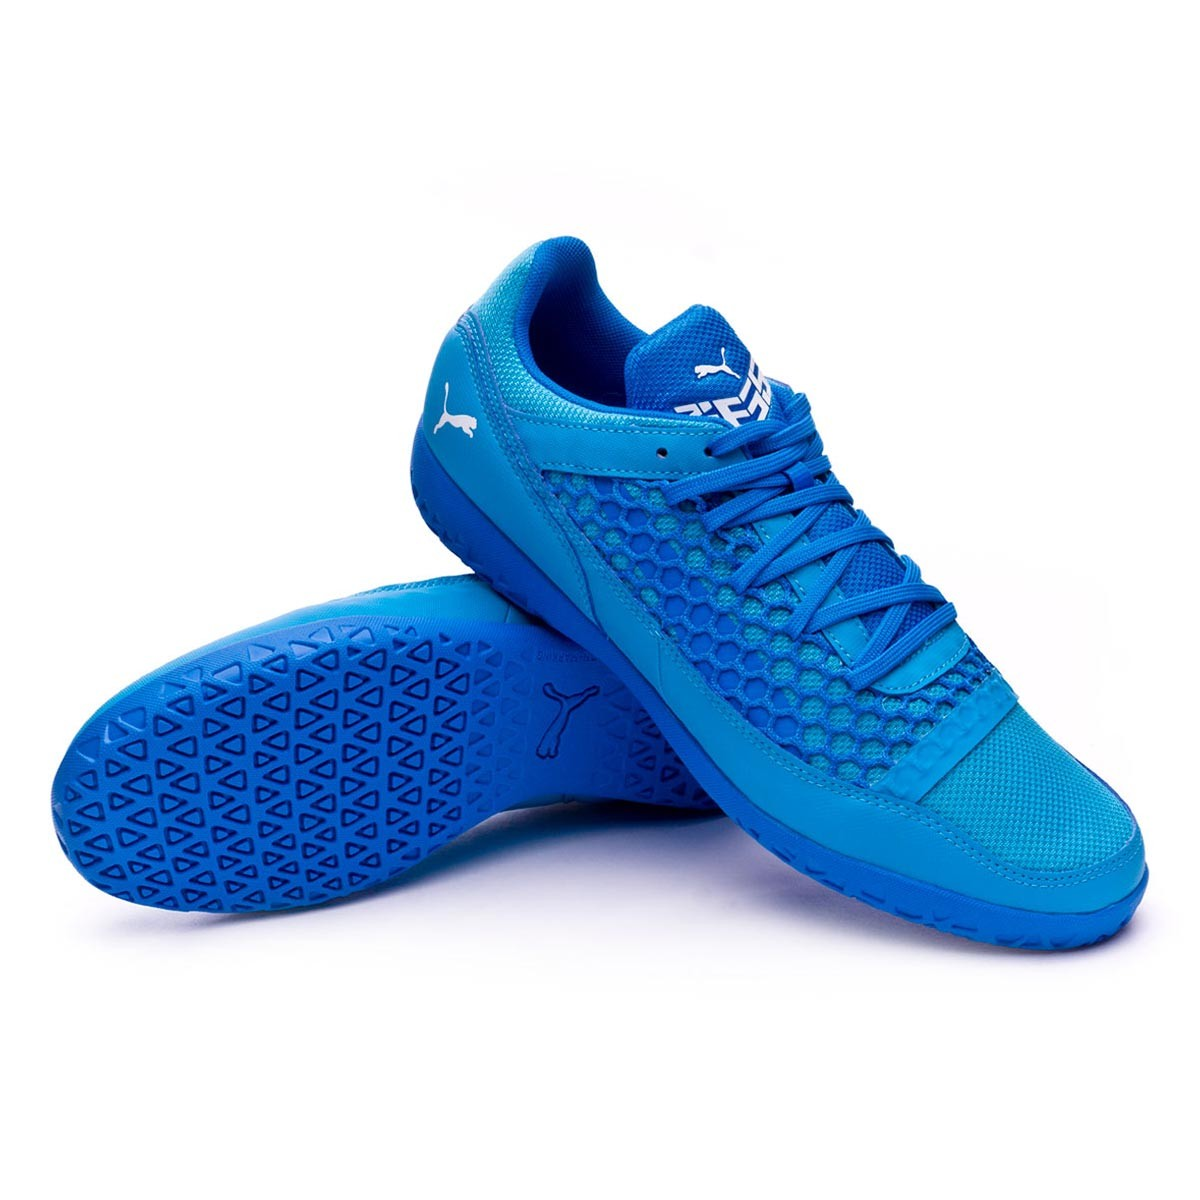 Puma 365 NF CT Futsal Boot. Electric Blue Lemonade-Puma White-Hawaiian ... f9e58a10e